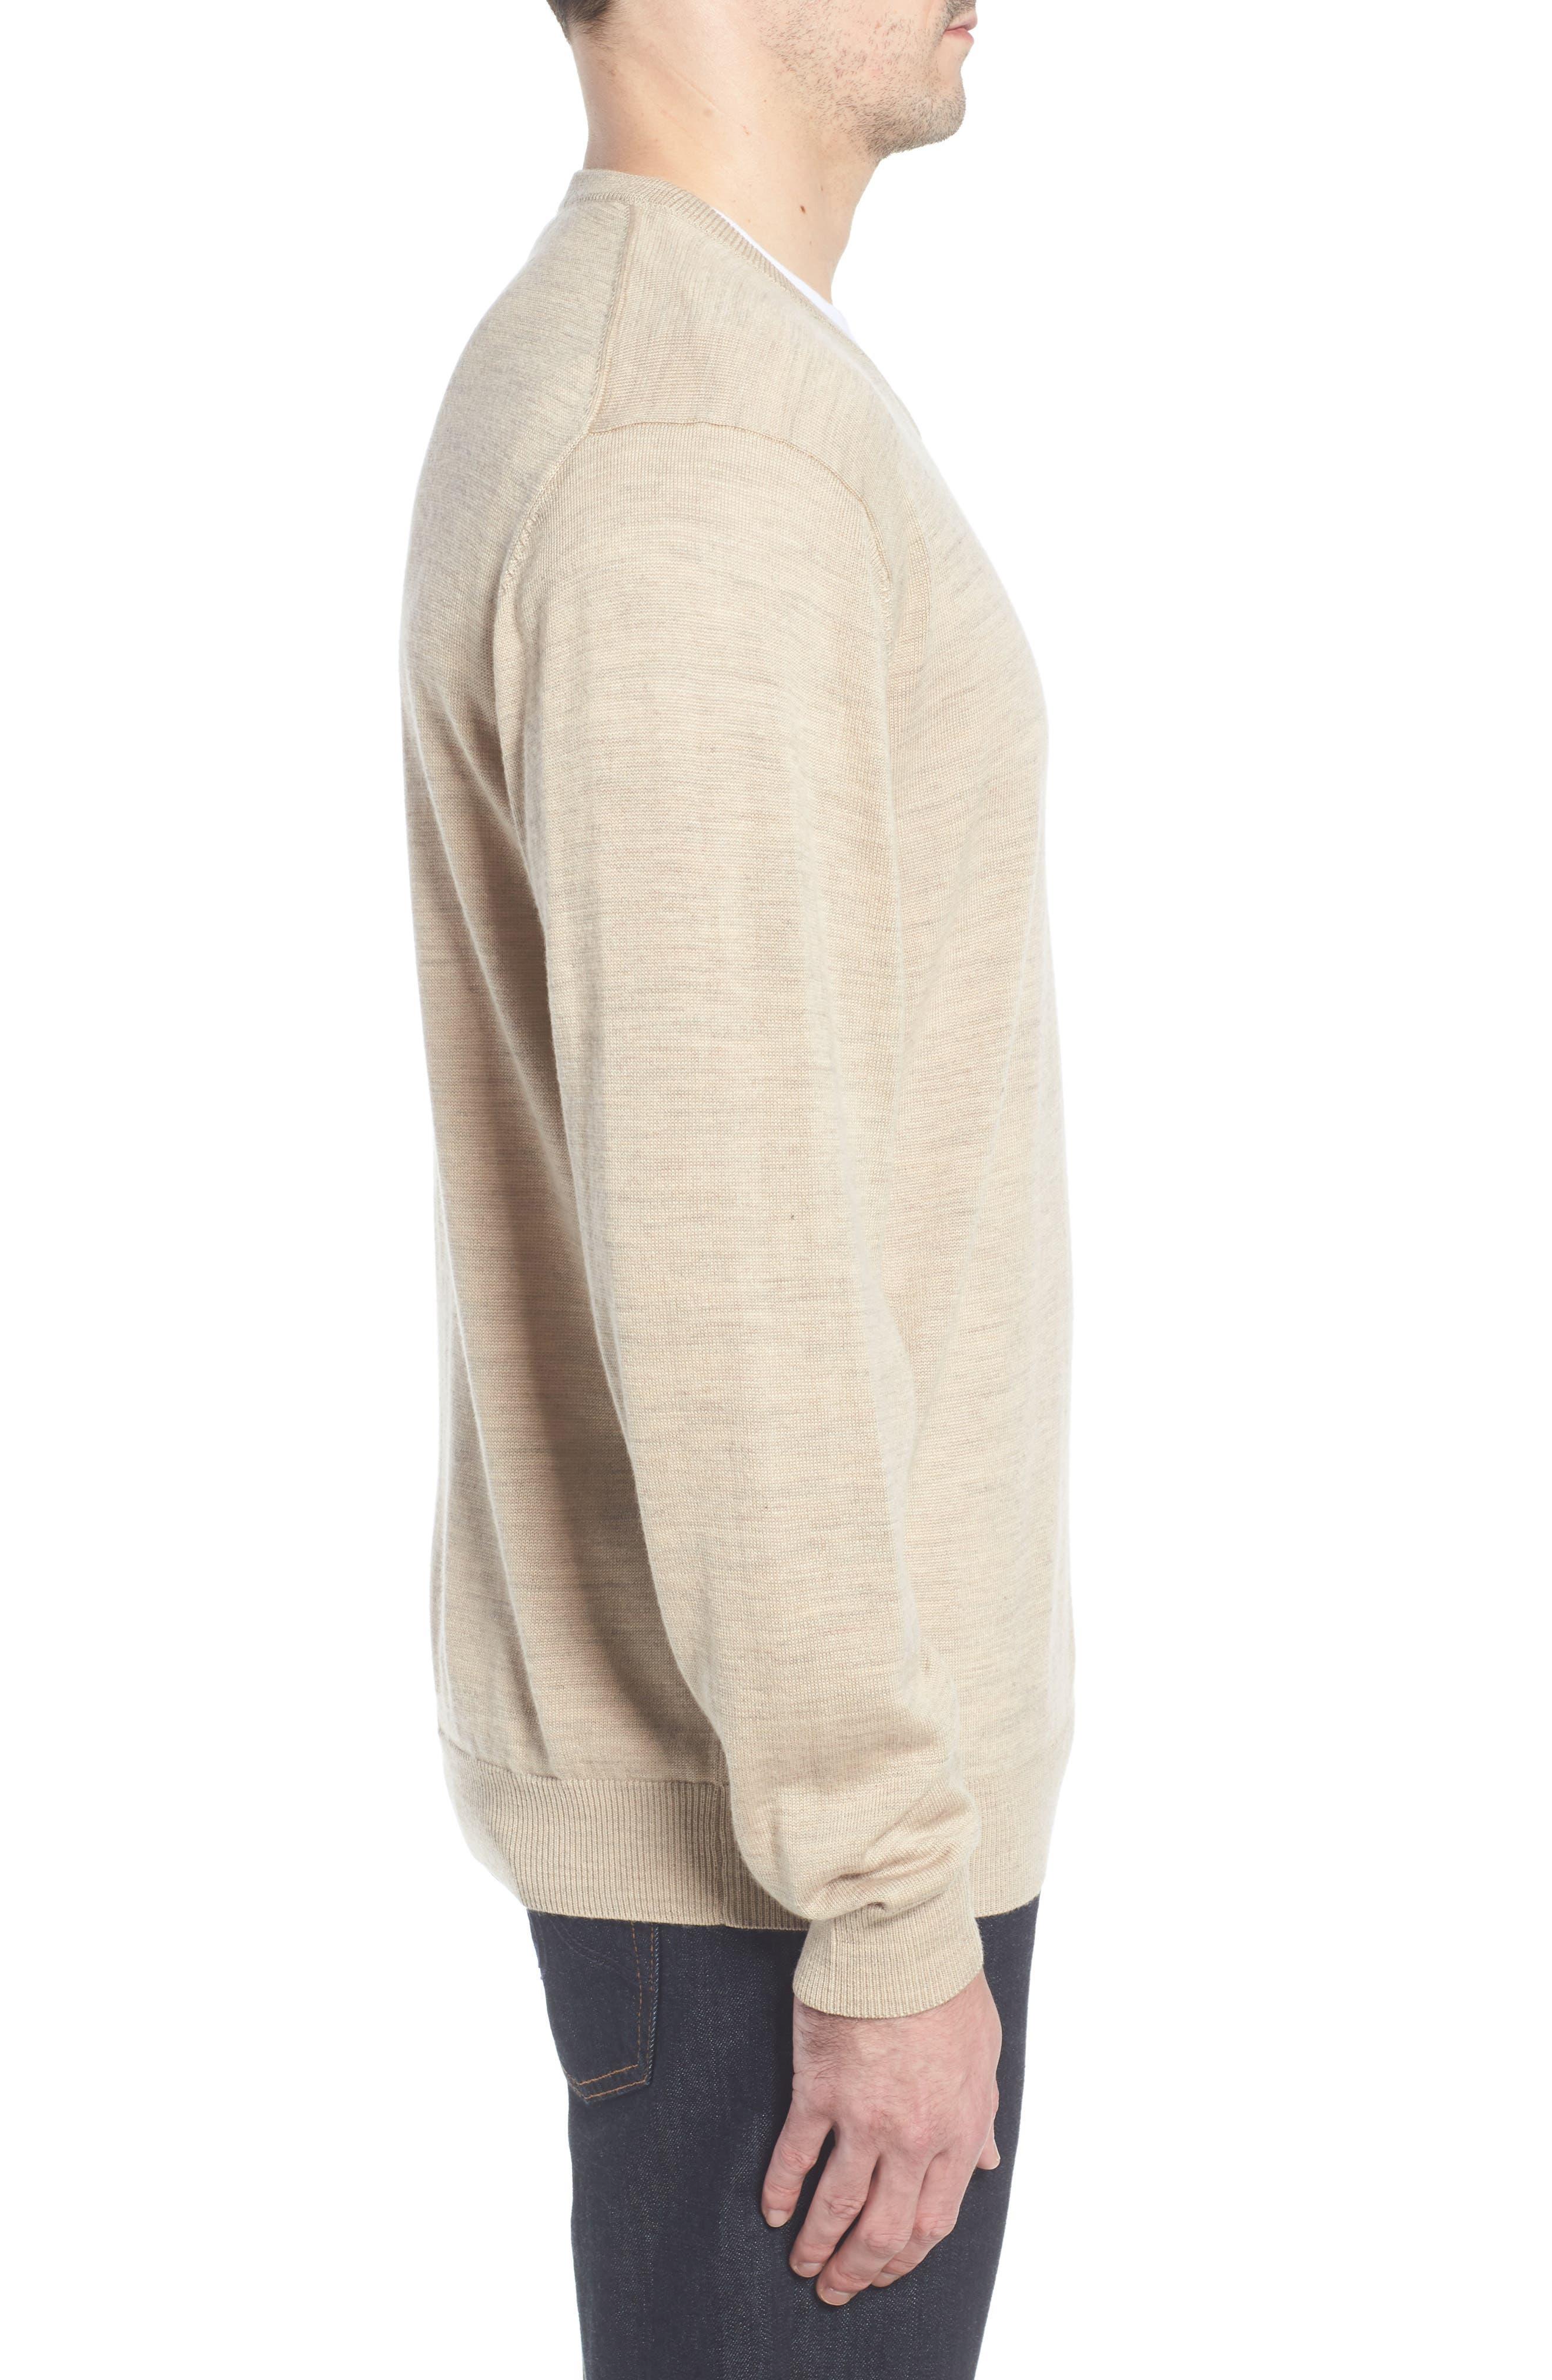 CUTTER & BUCK, 'Douglas' Merino Wool Blend V-Neck Sweater, Alternate thumbnail 3, color, SAND HEATHER